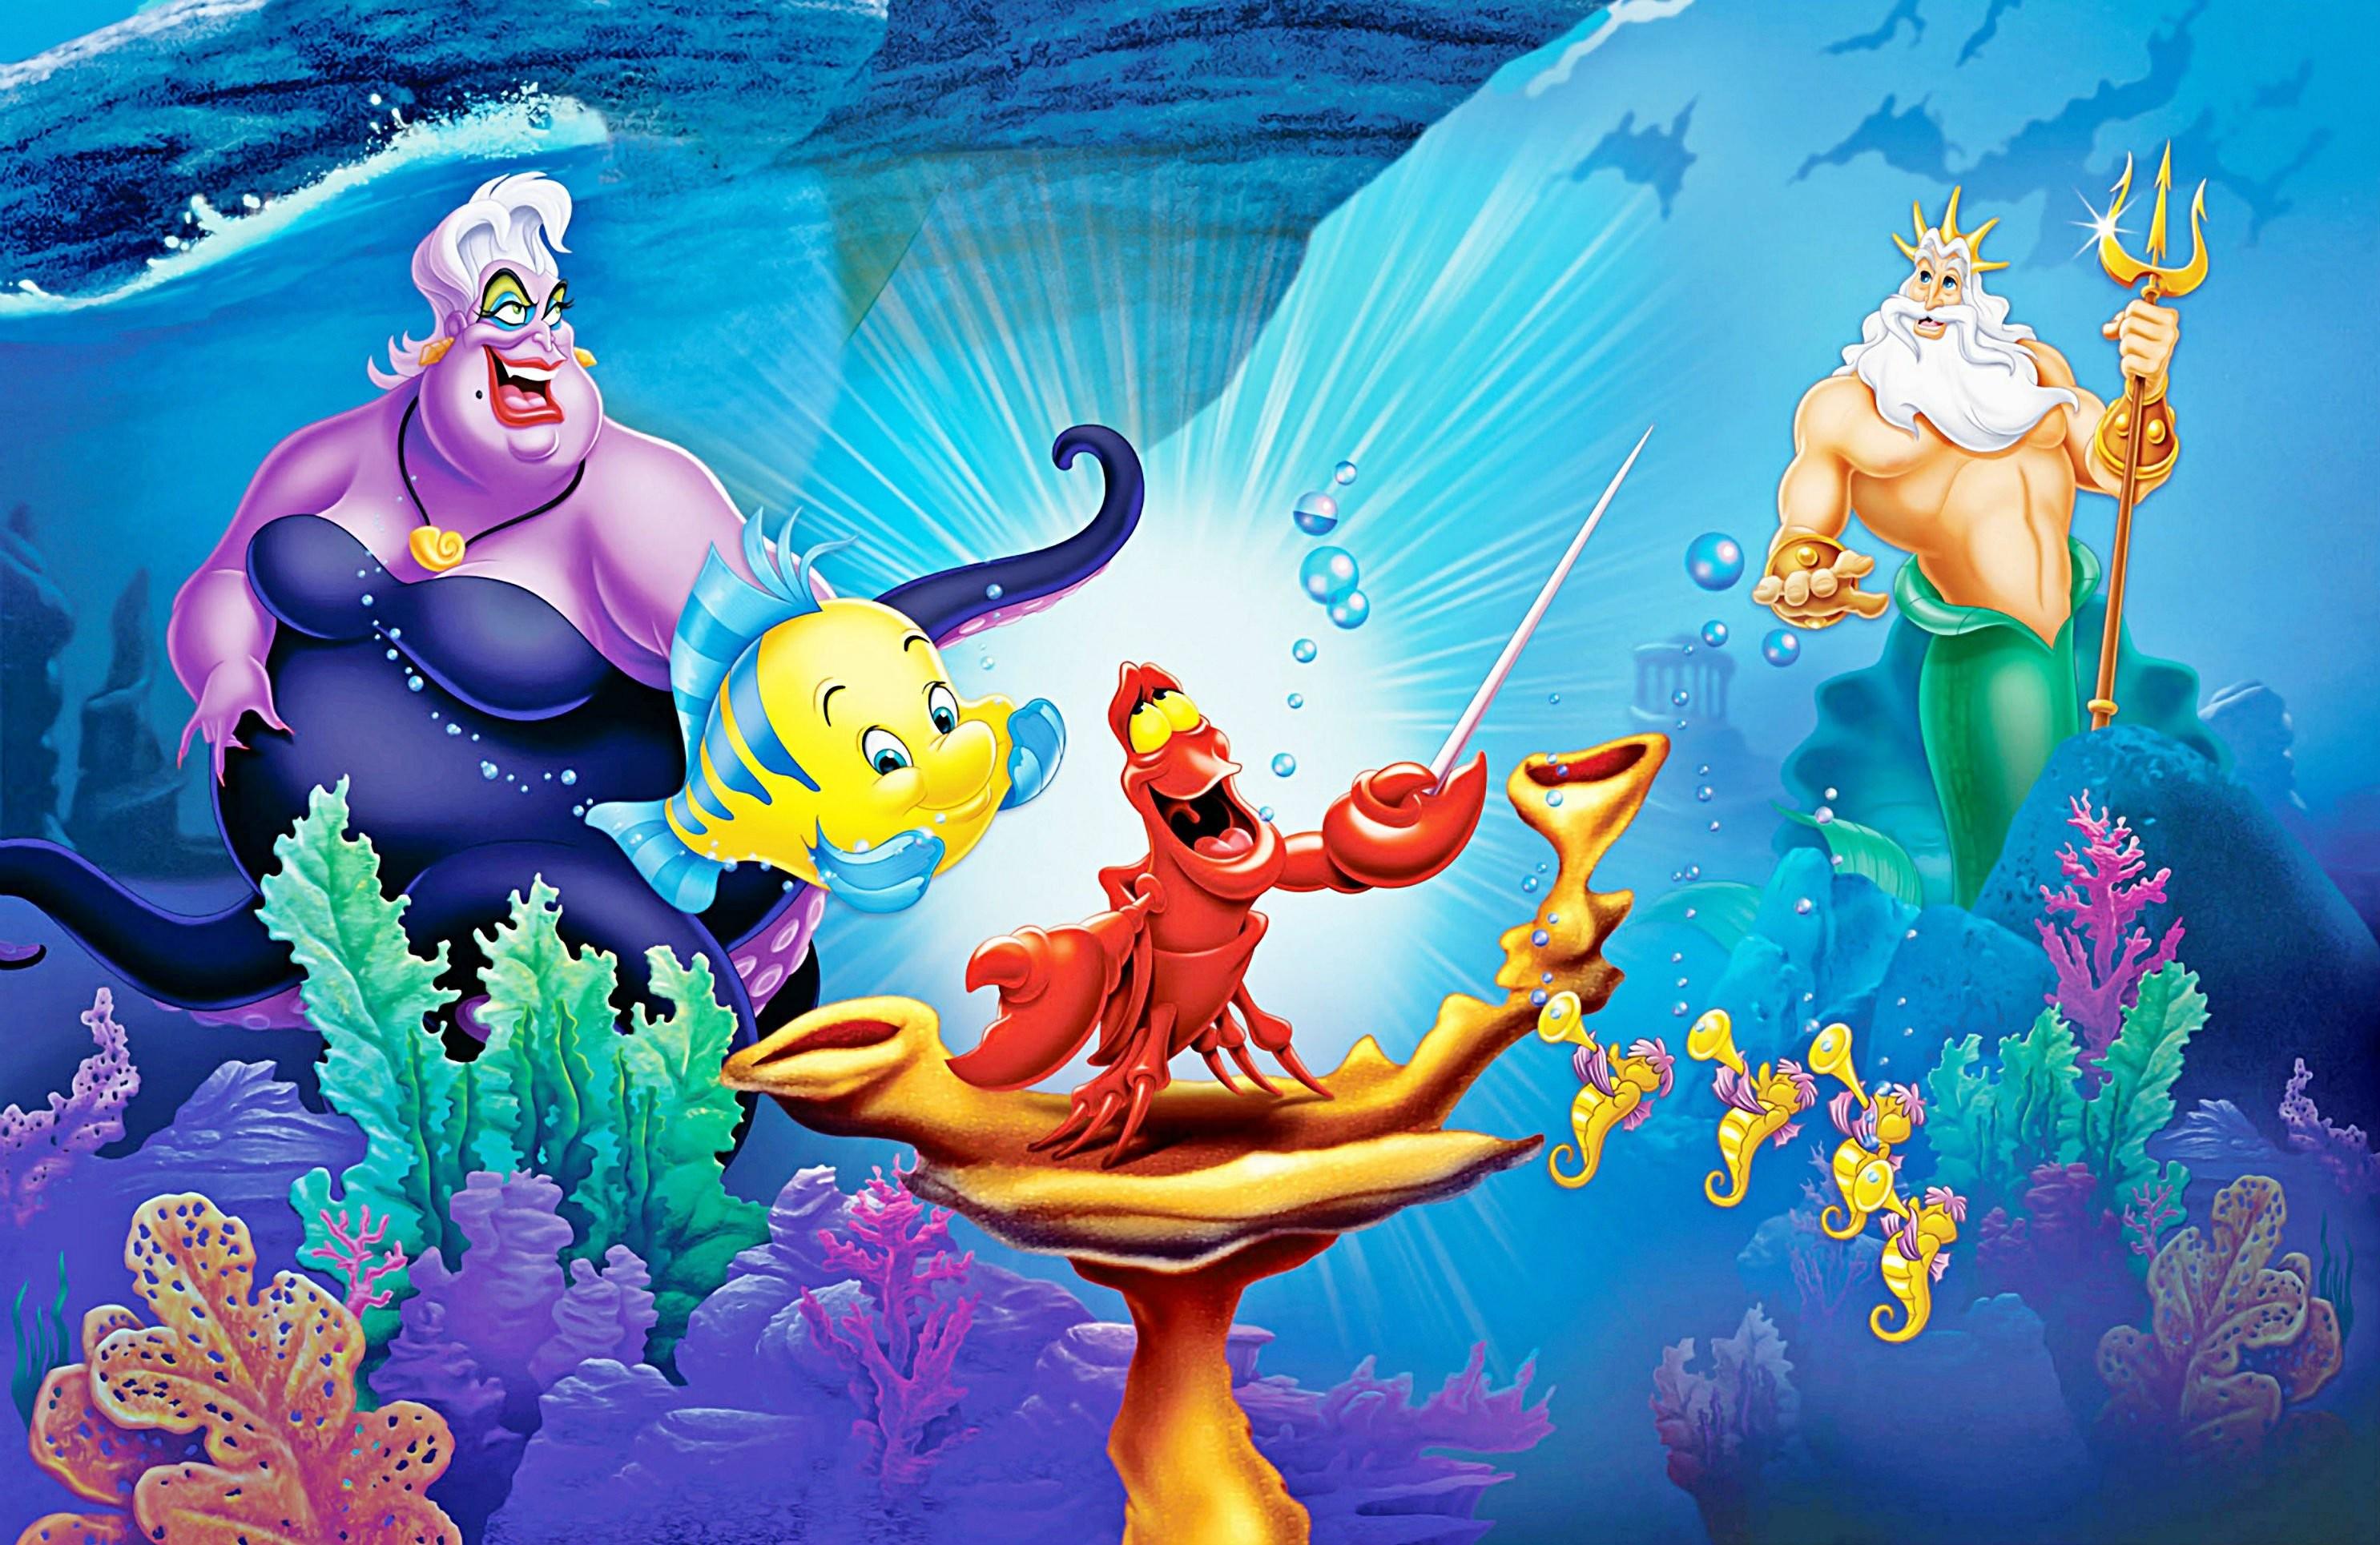 disney-princess-ariel-mermaid-wallpaper-3.jpg (2971×1929)   wallpaper    Pinterest   Ariel, Funny pictures and Disney minimalist